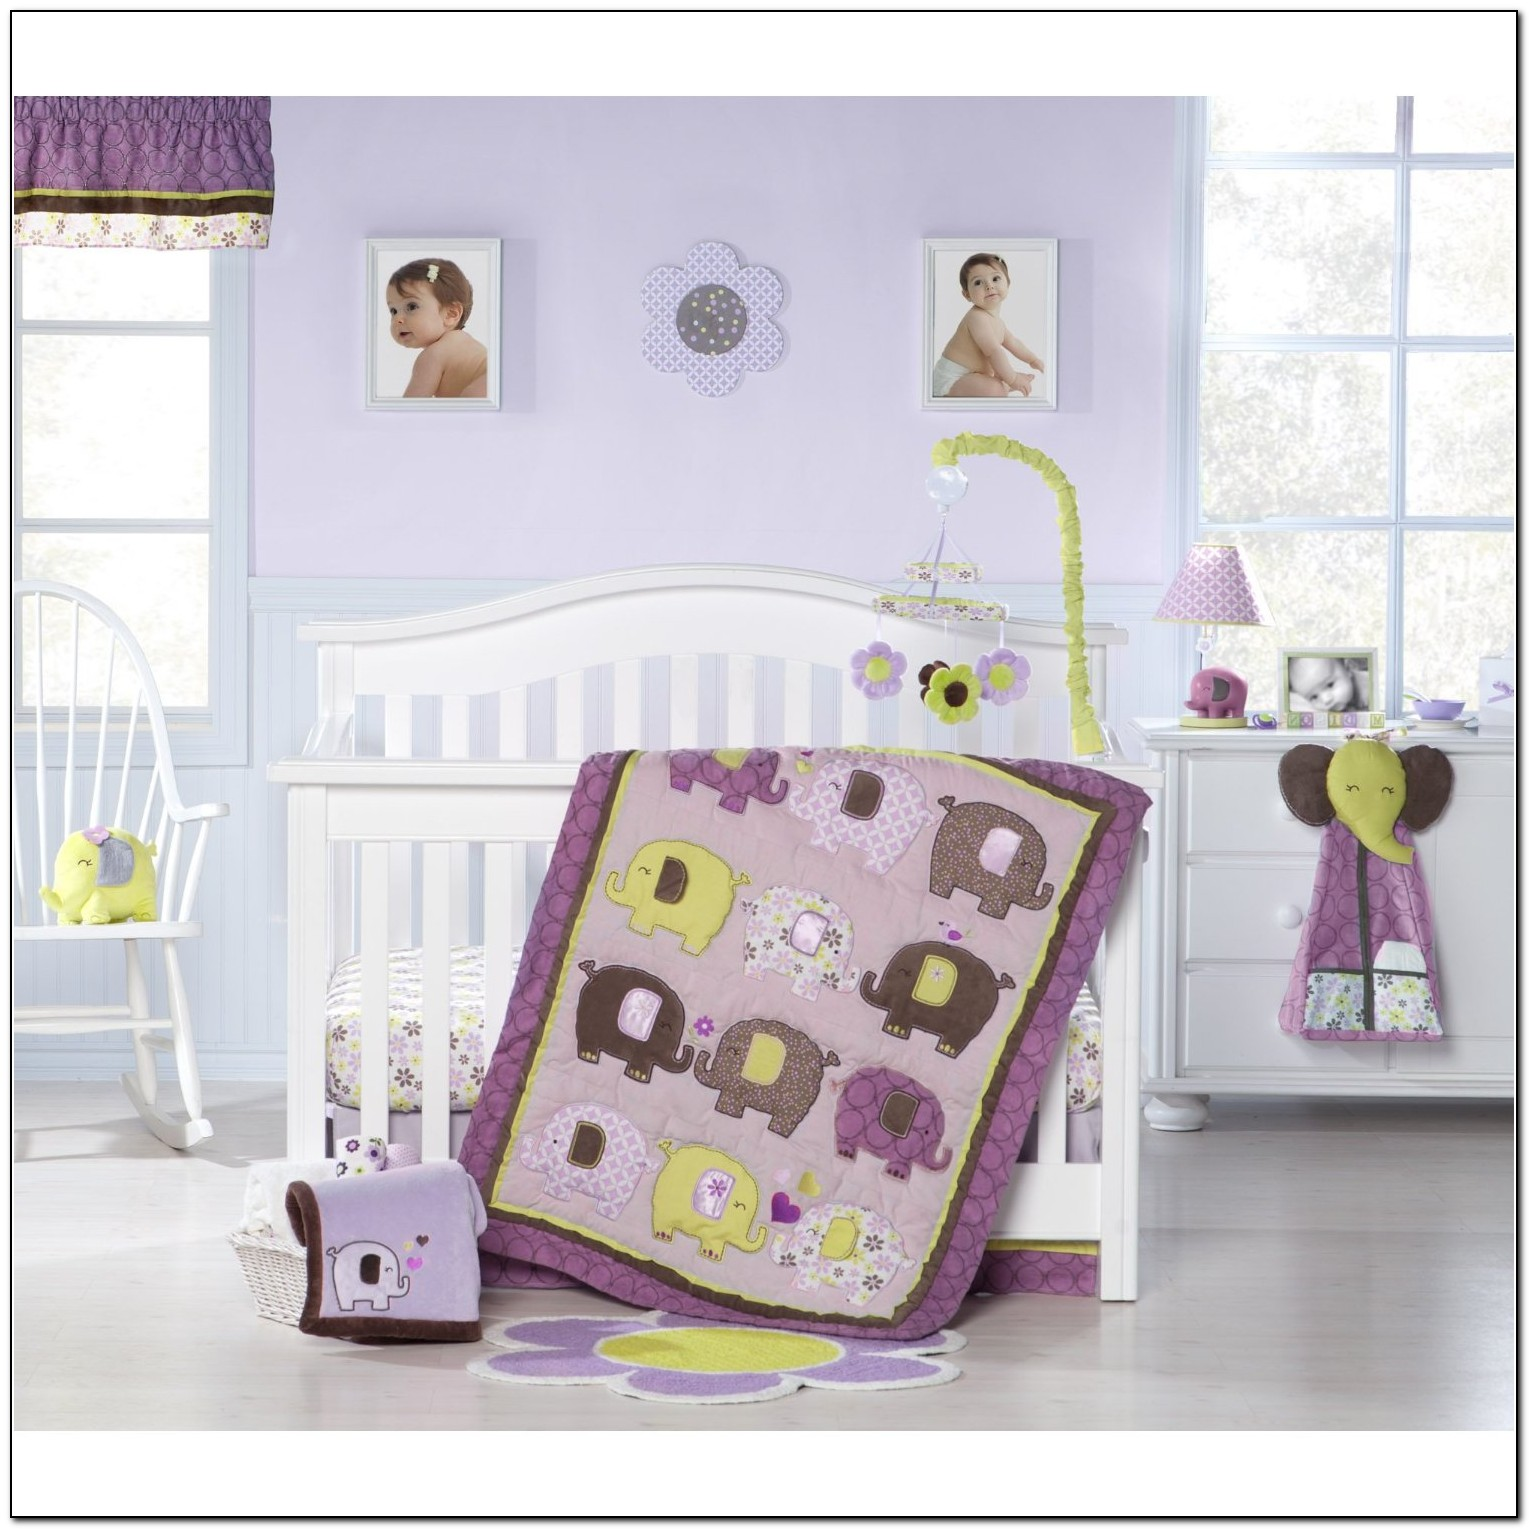 Purple Elephant Crib Bedding Beds Home Design Ideas